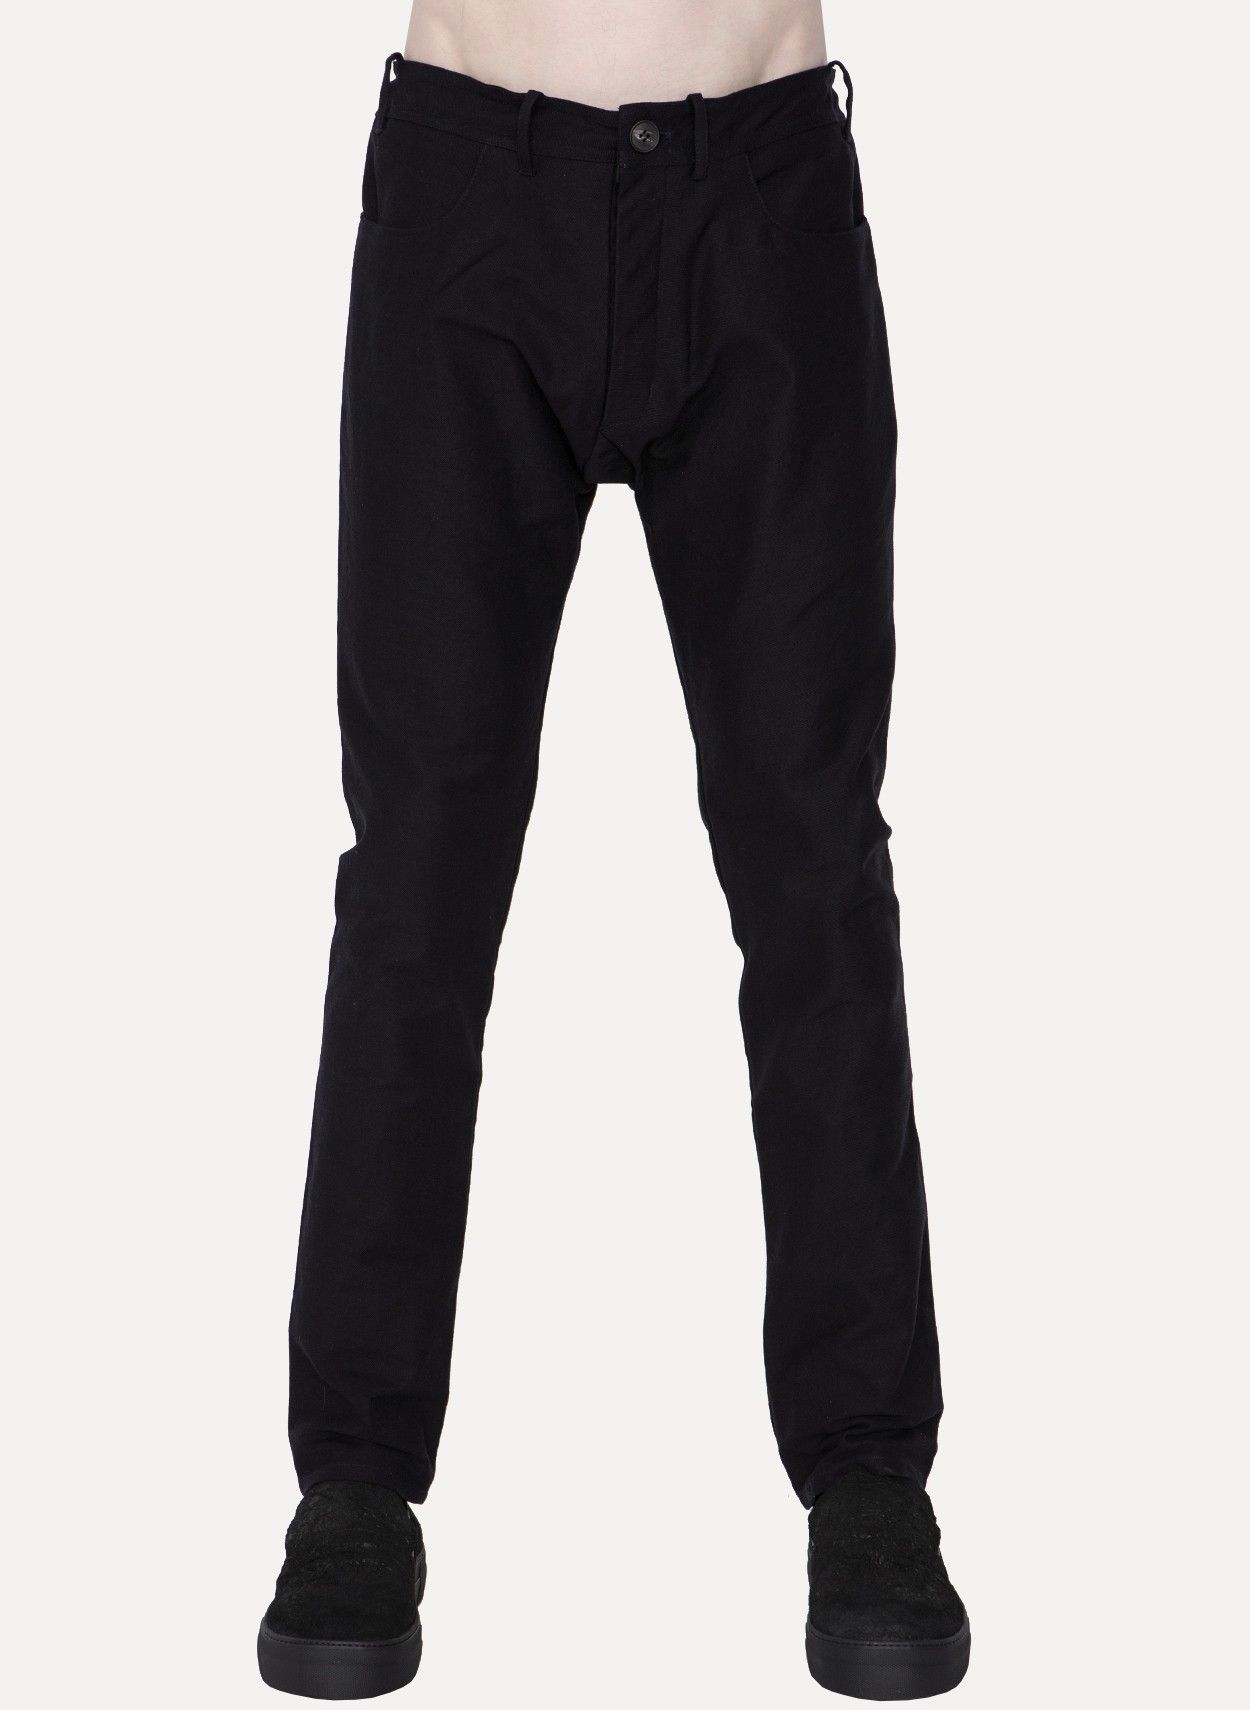 TROUSERS-26 Waxed Denim Slim Fit Trousers https://cruvoir.com/jan-jan-van-essche/5684-trousers-26-waxed-denim-slim-fit-trousers-nightblue